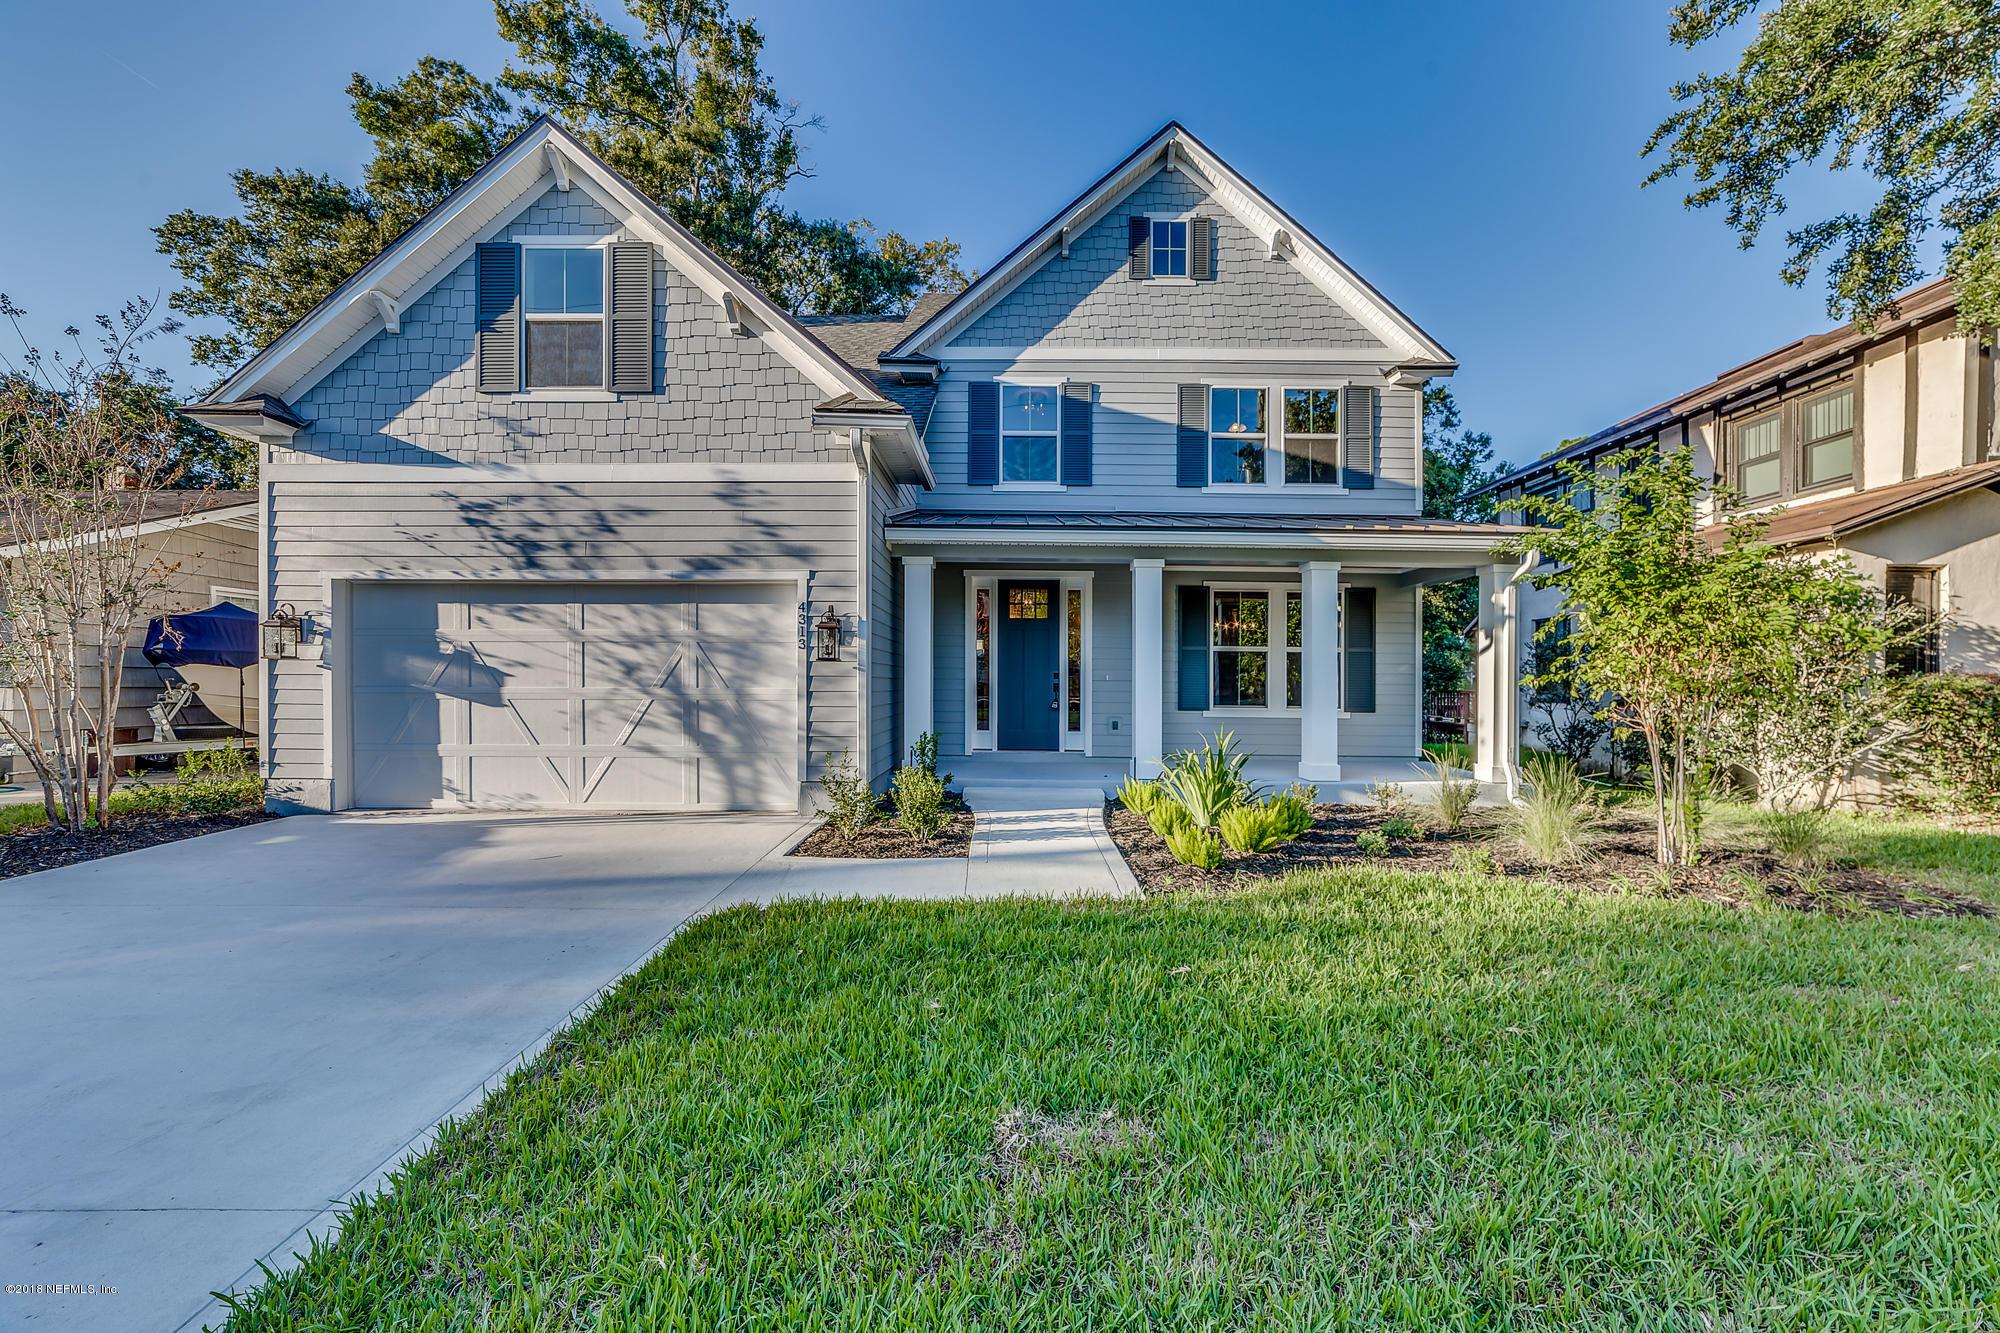 4313 GENOA, JACKSONVILLE, FLORIDA 32210, 4 Bedrooms Bedrooms, ,2 BathroomsBathrooms,Residential - single family,For sale,GENOA,961343